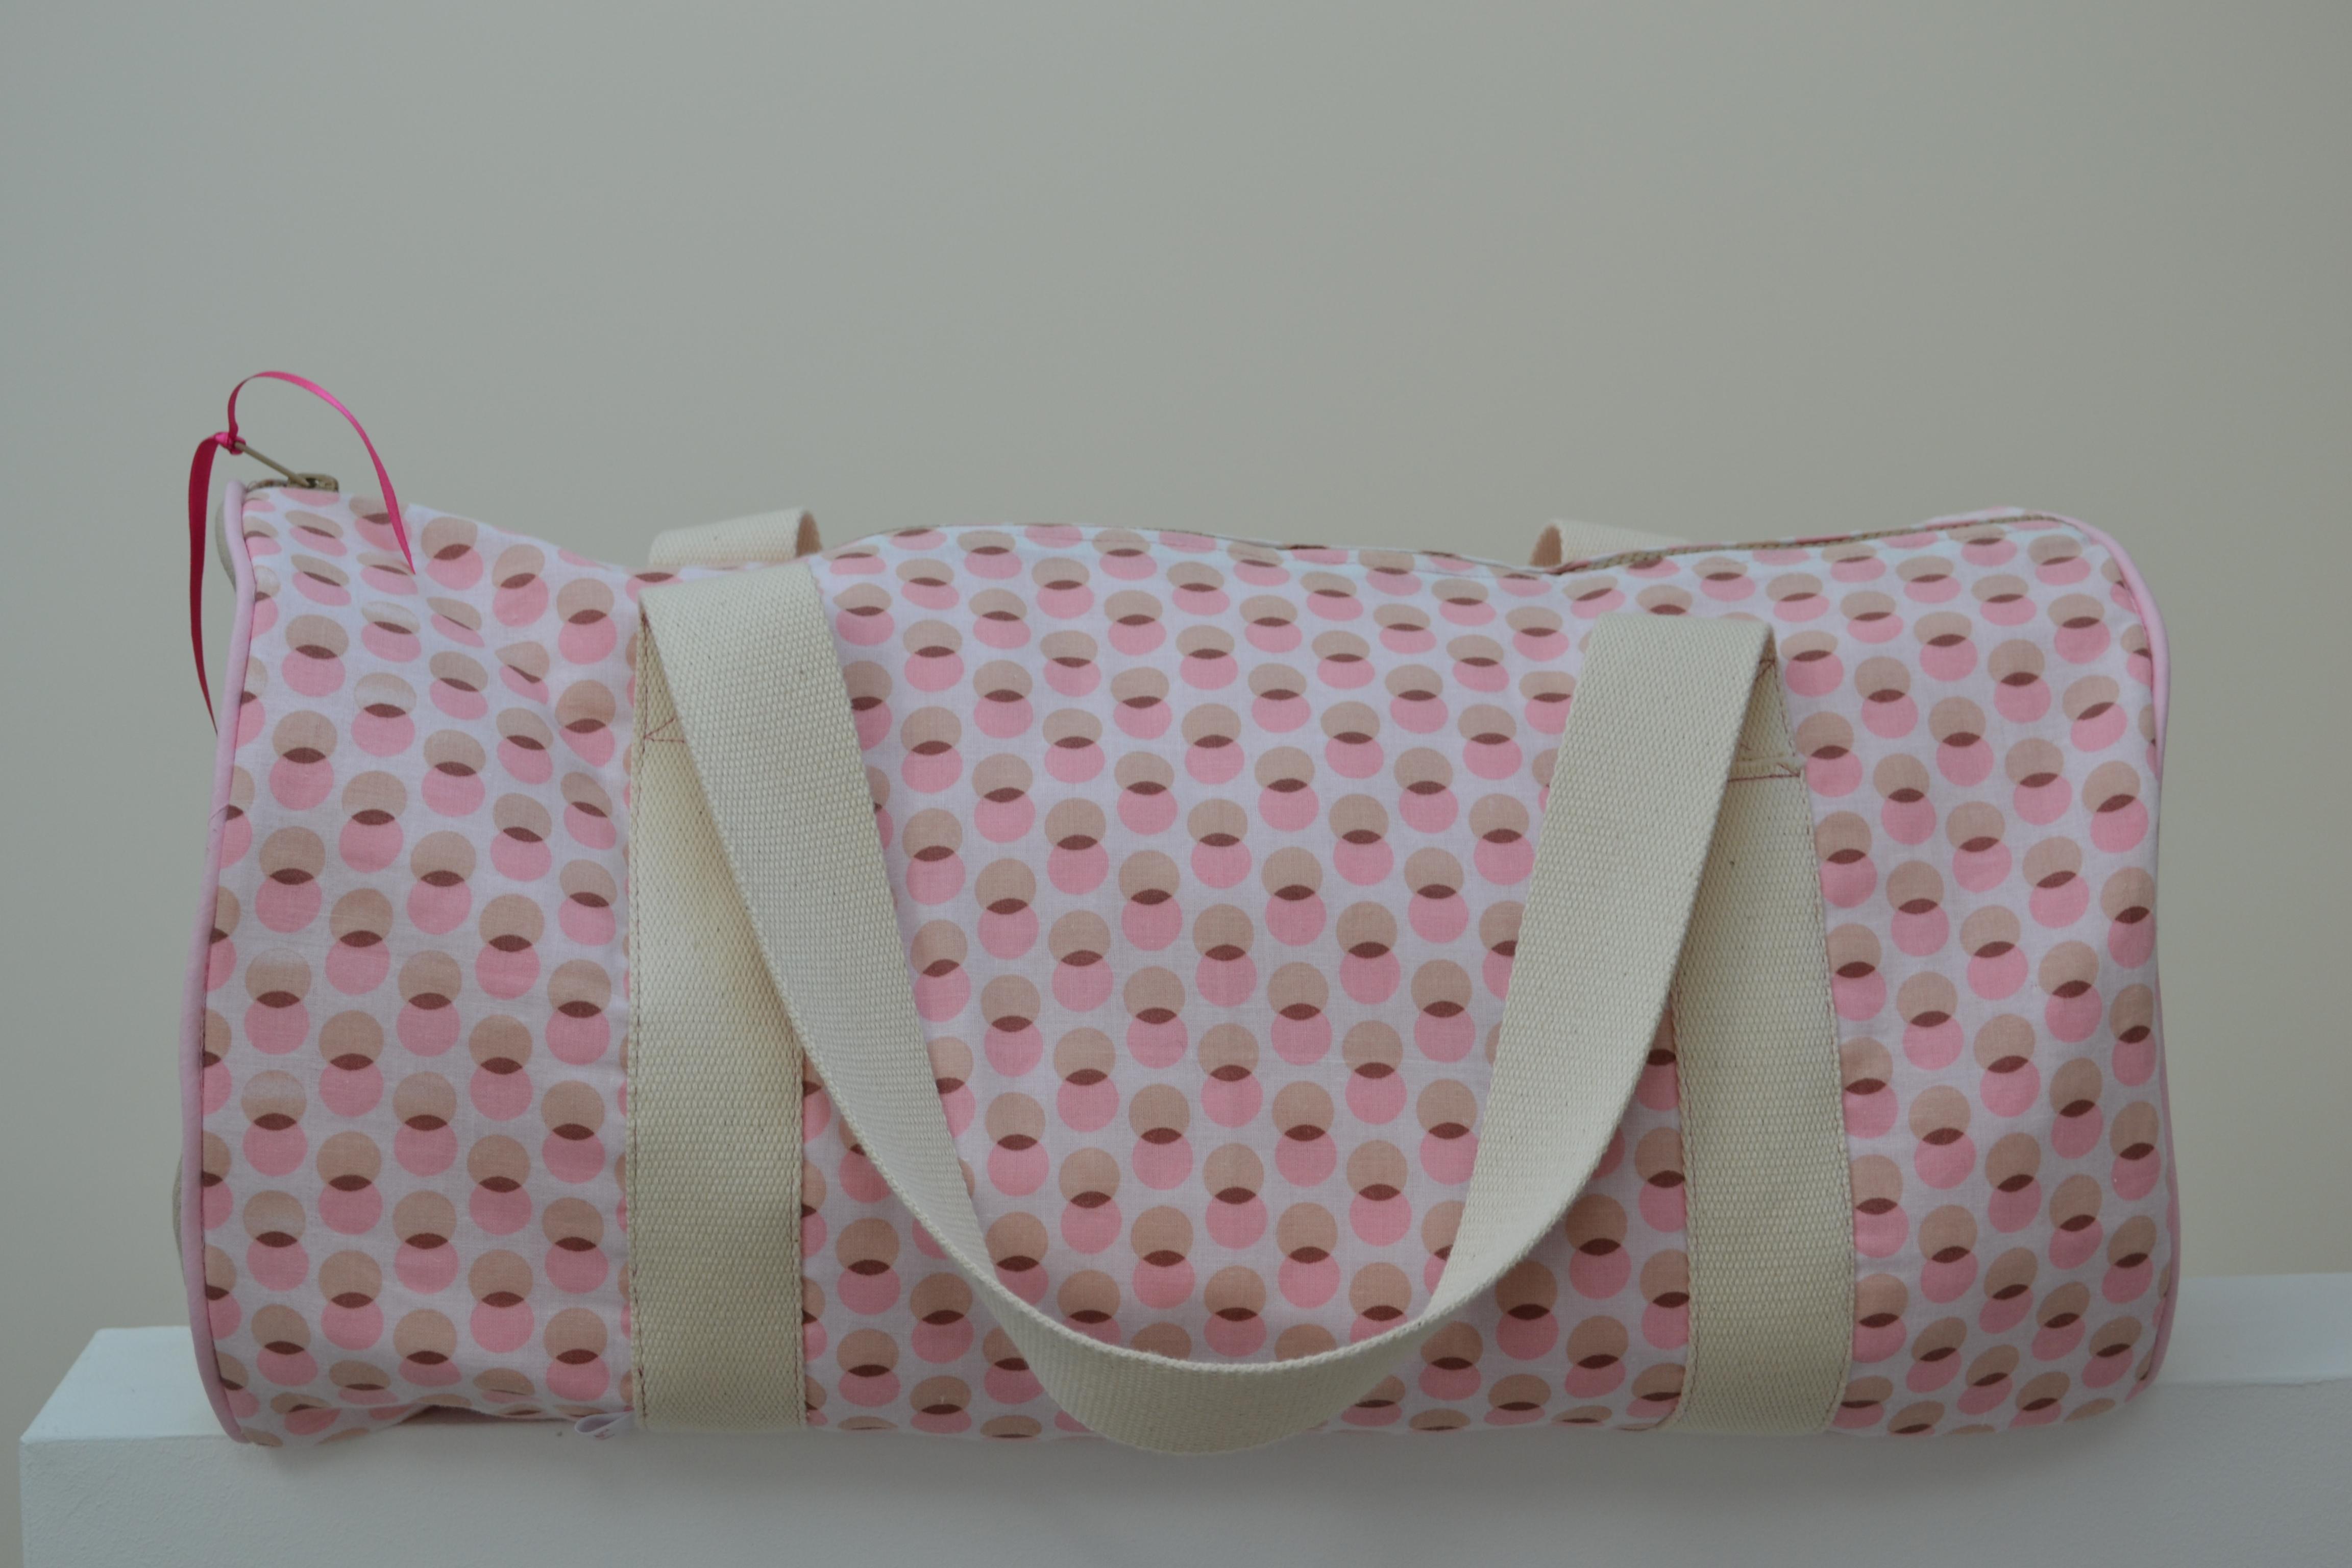 sac de voyage cute you 39 re. Black Bedroom Furniture Sets. Home Design Ideas